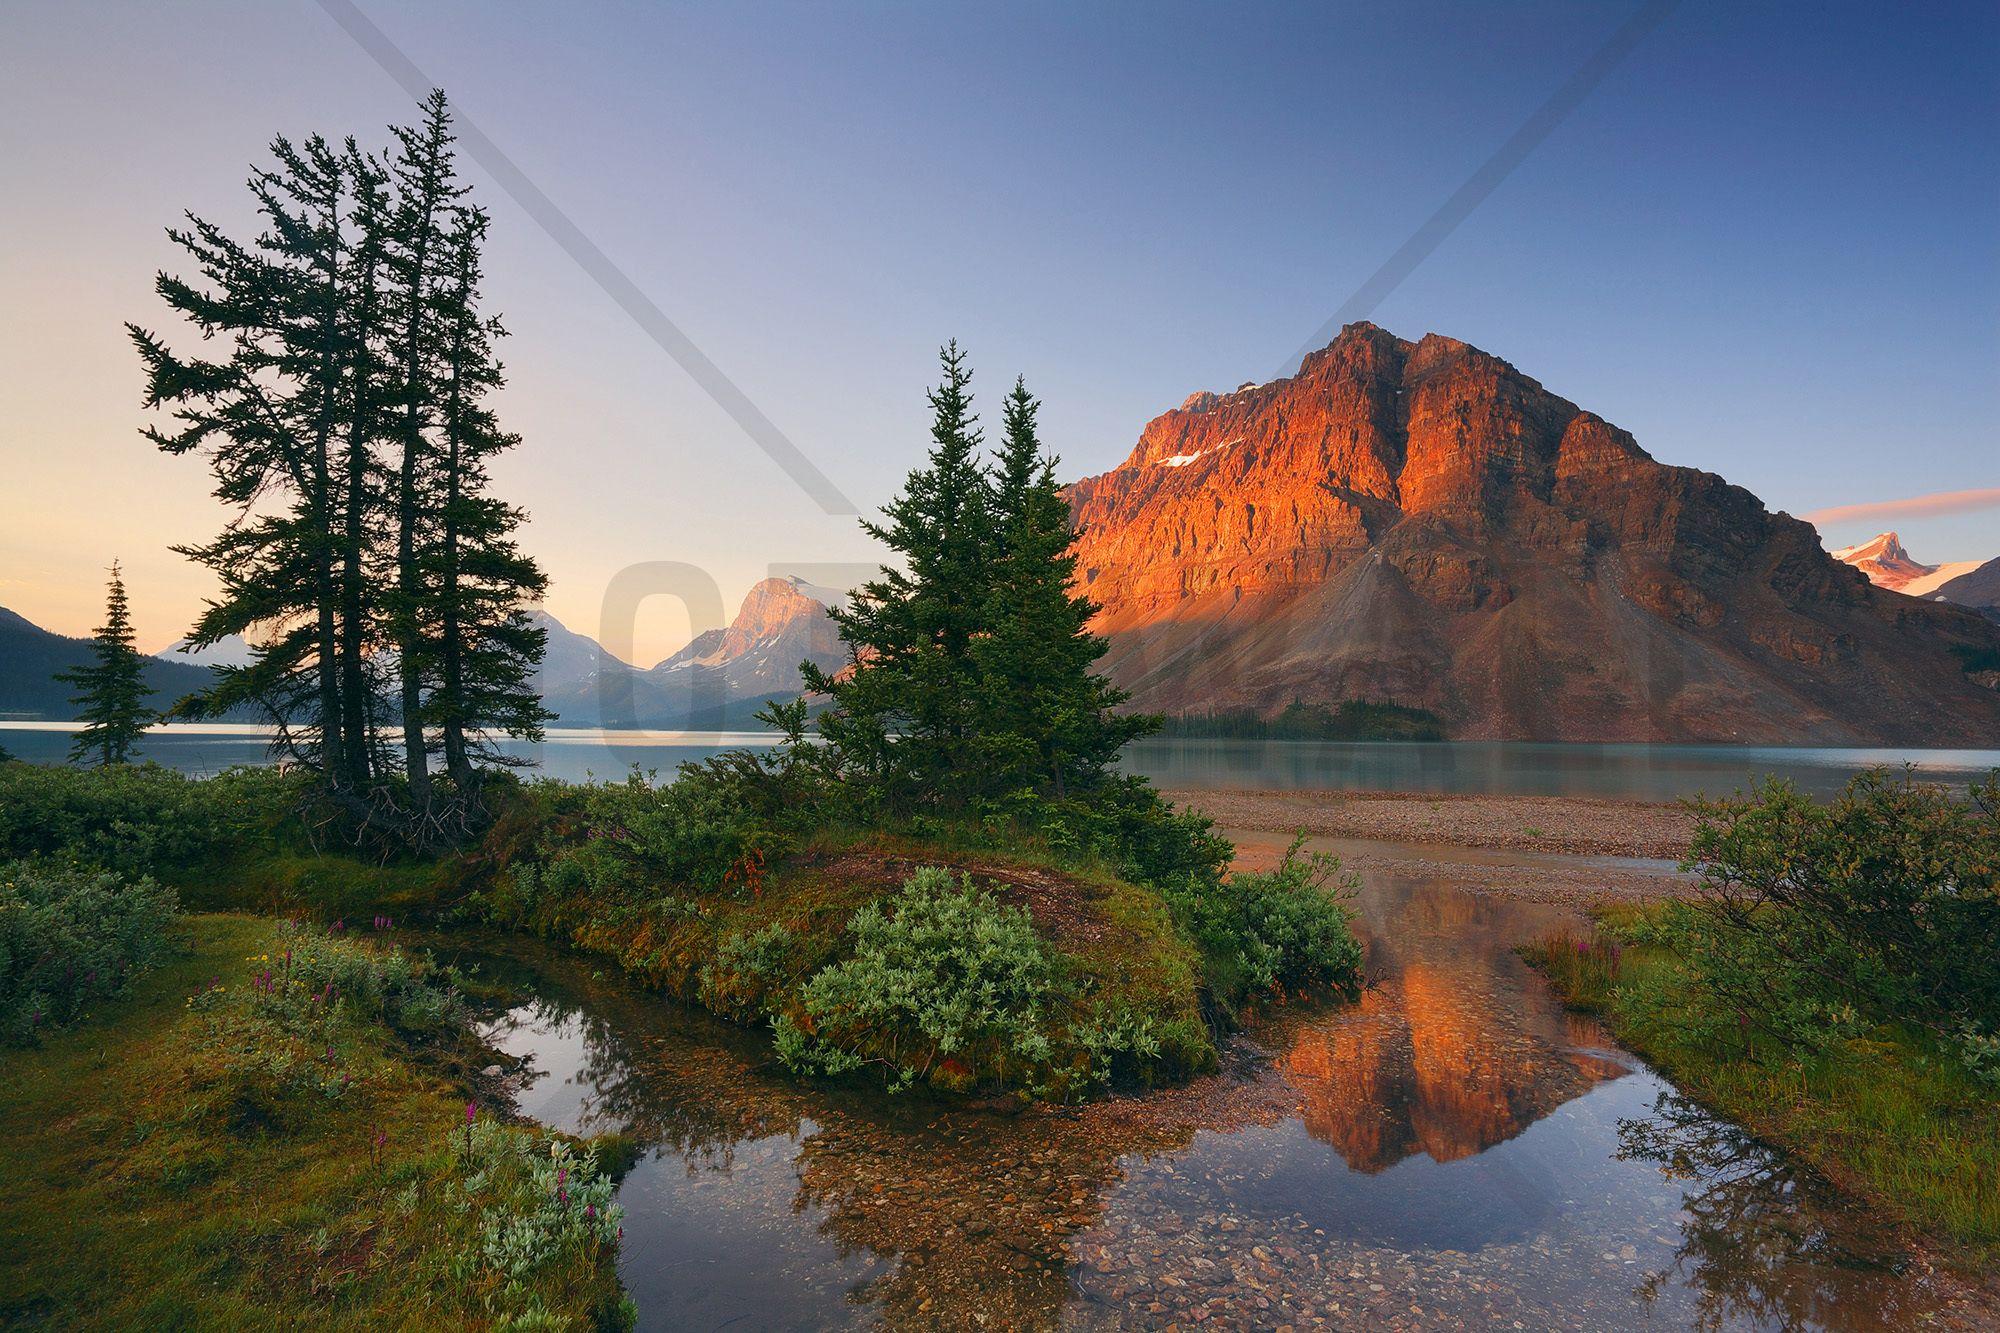 Crowfoot Mountain Reflection Wall Mural & Photo